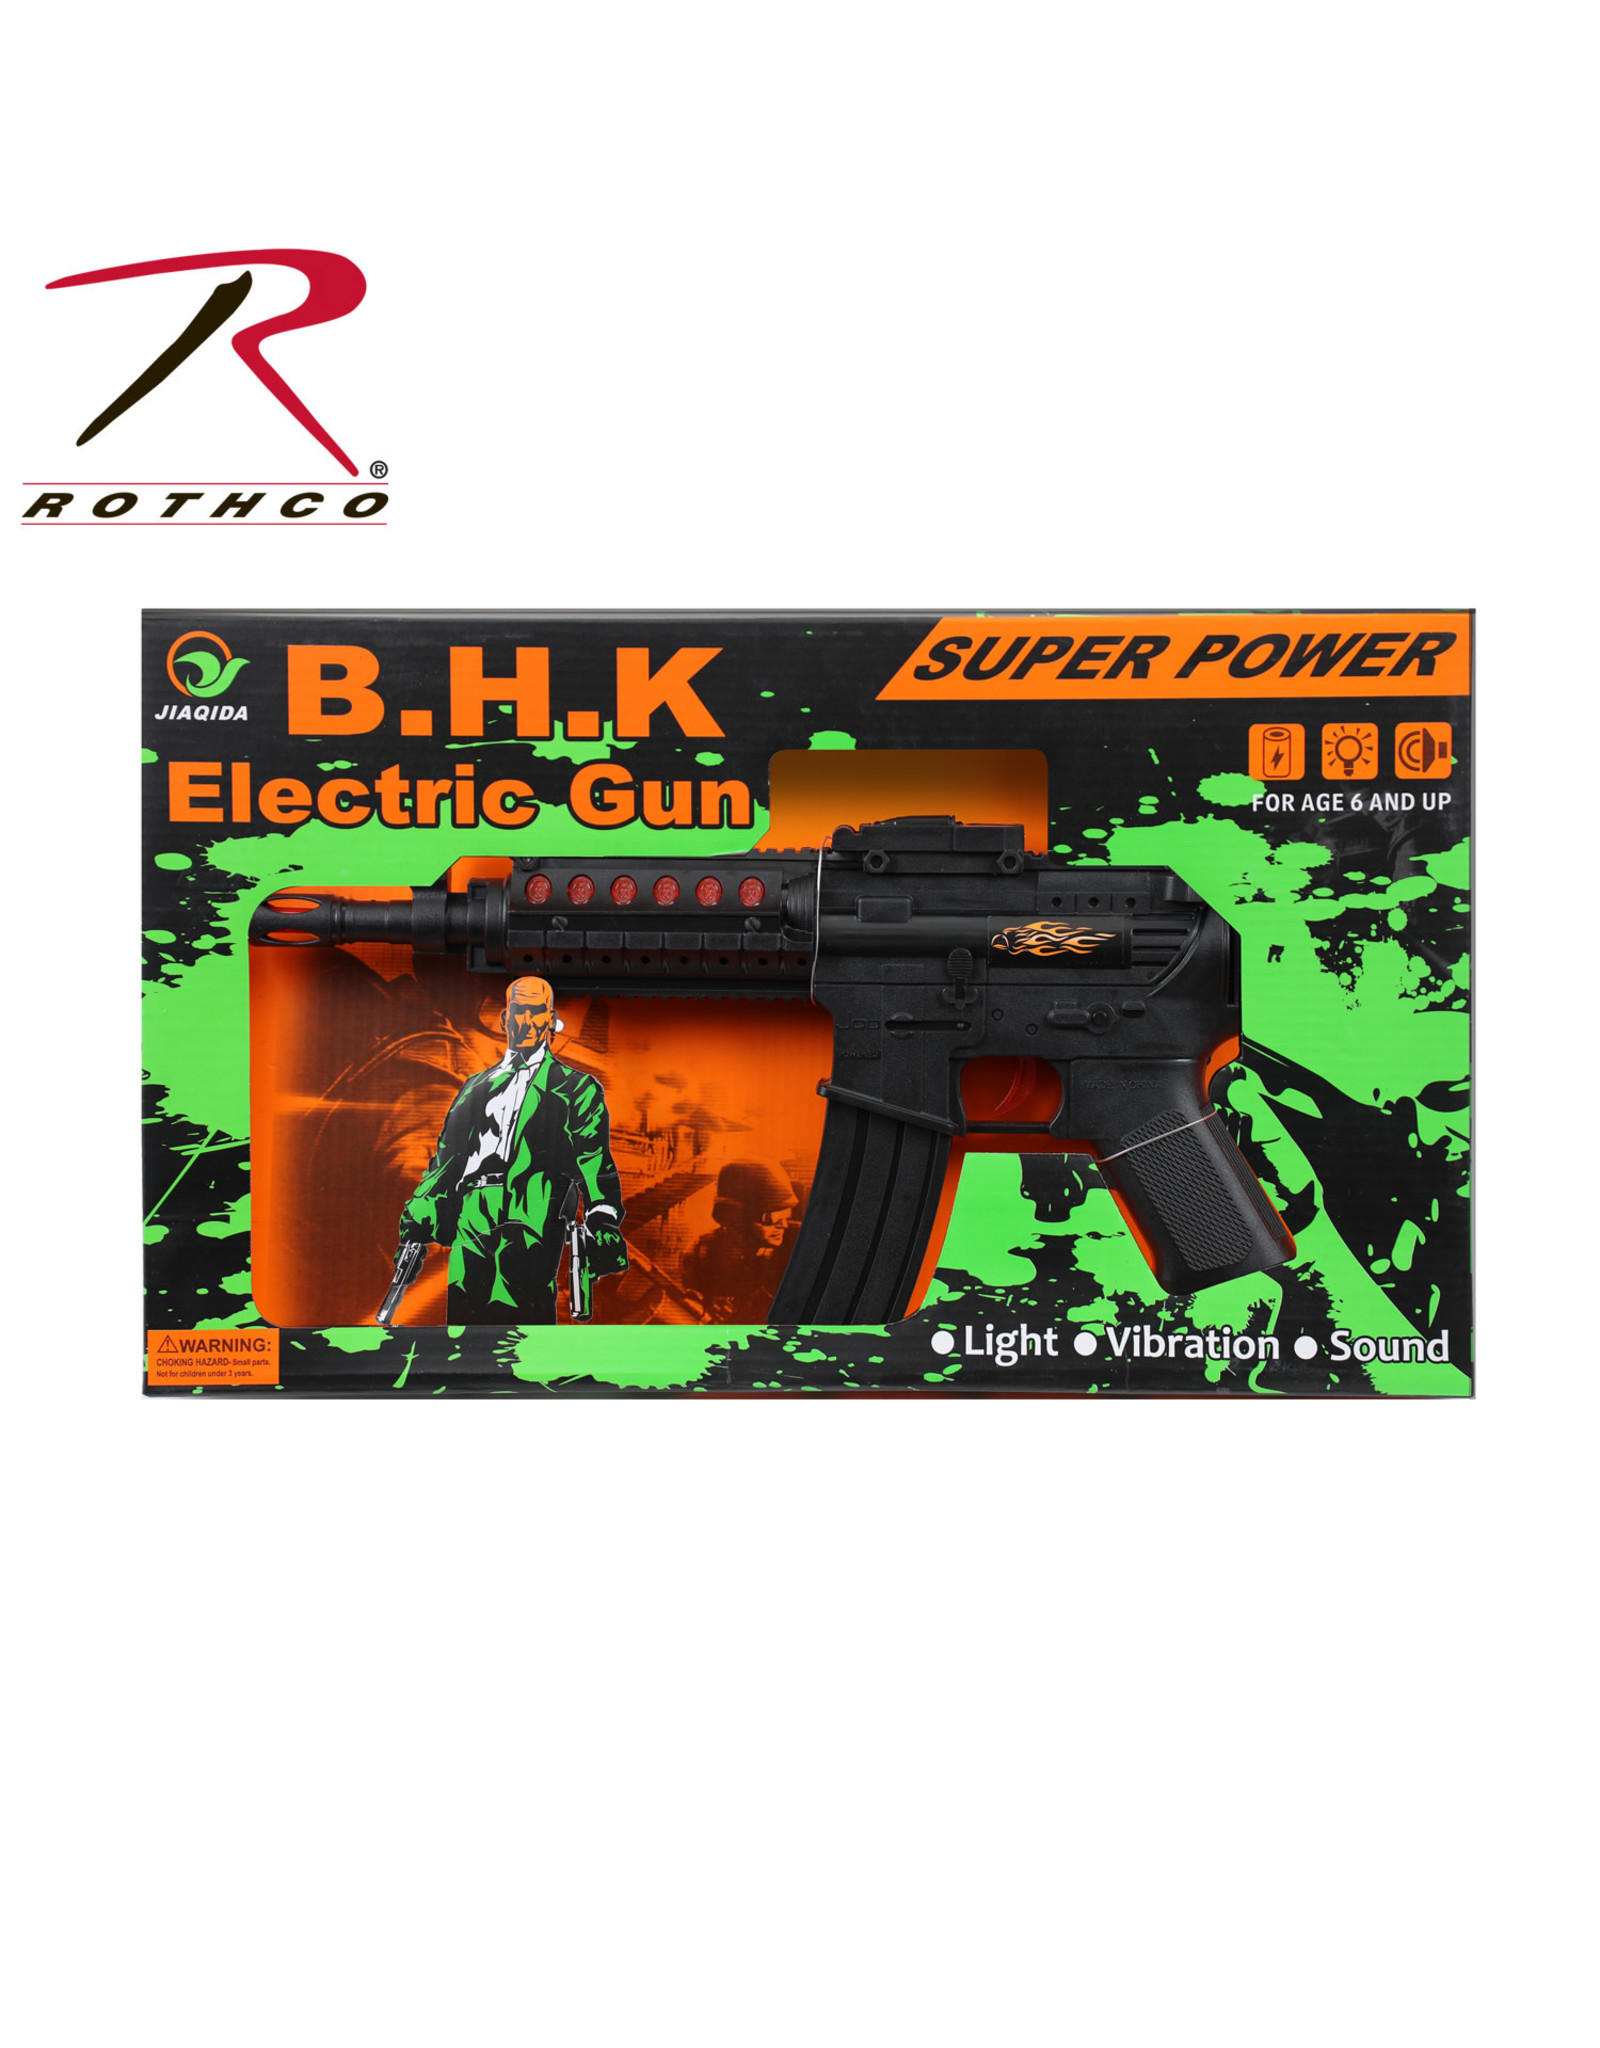 Special Forces Combat Toy Gun